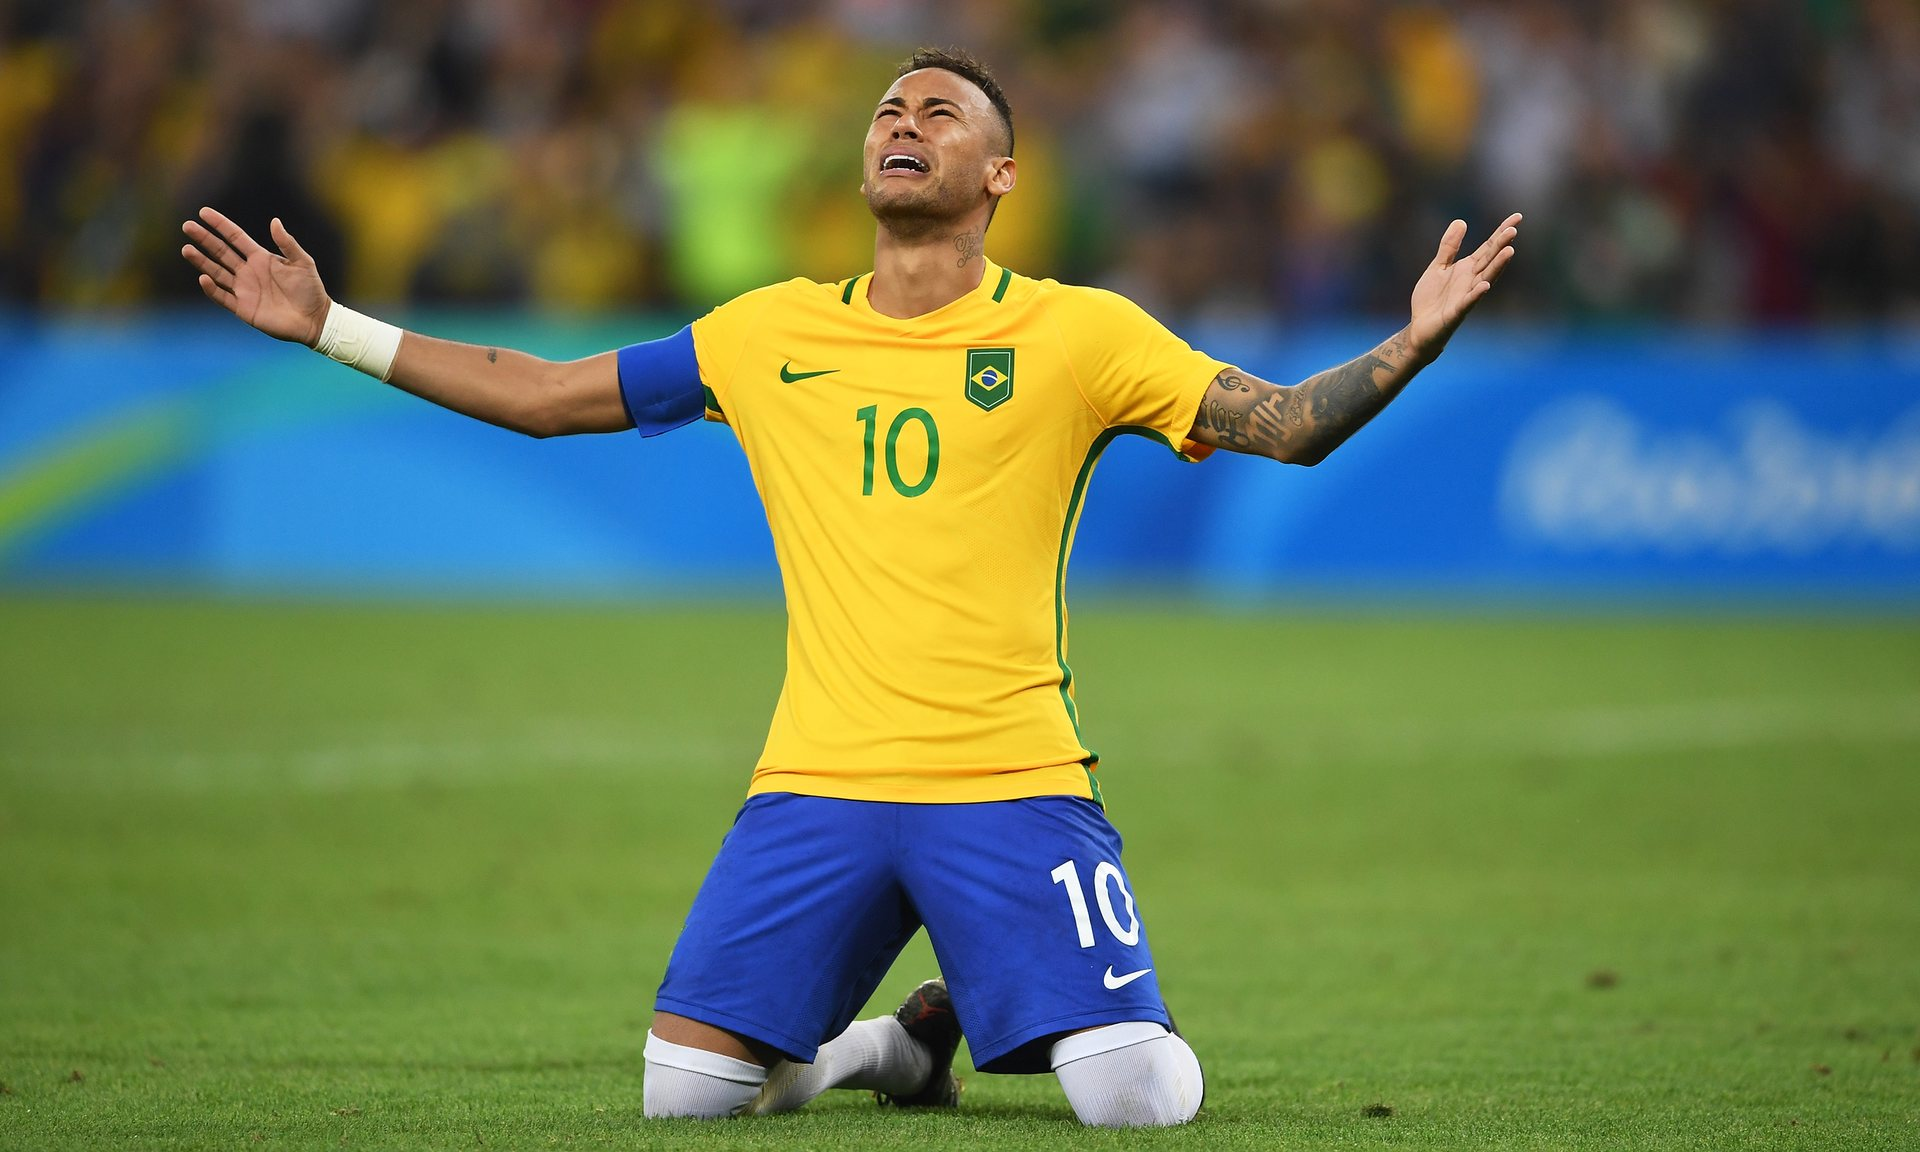 hinh-anh-neymar-dep-khong-the-bo-qua 1